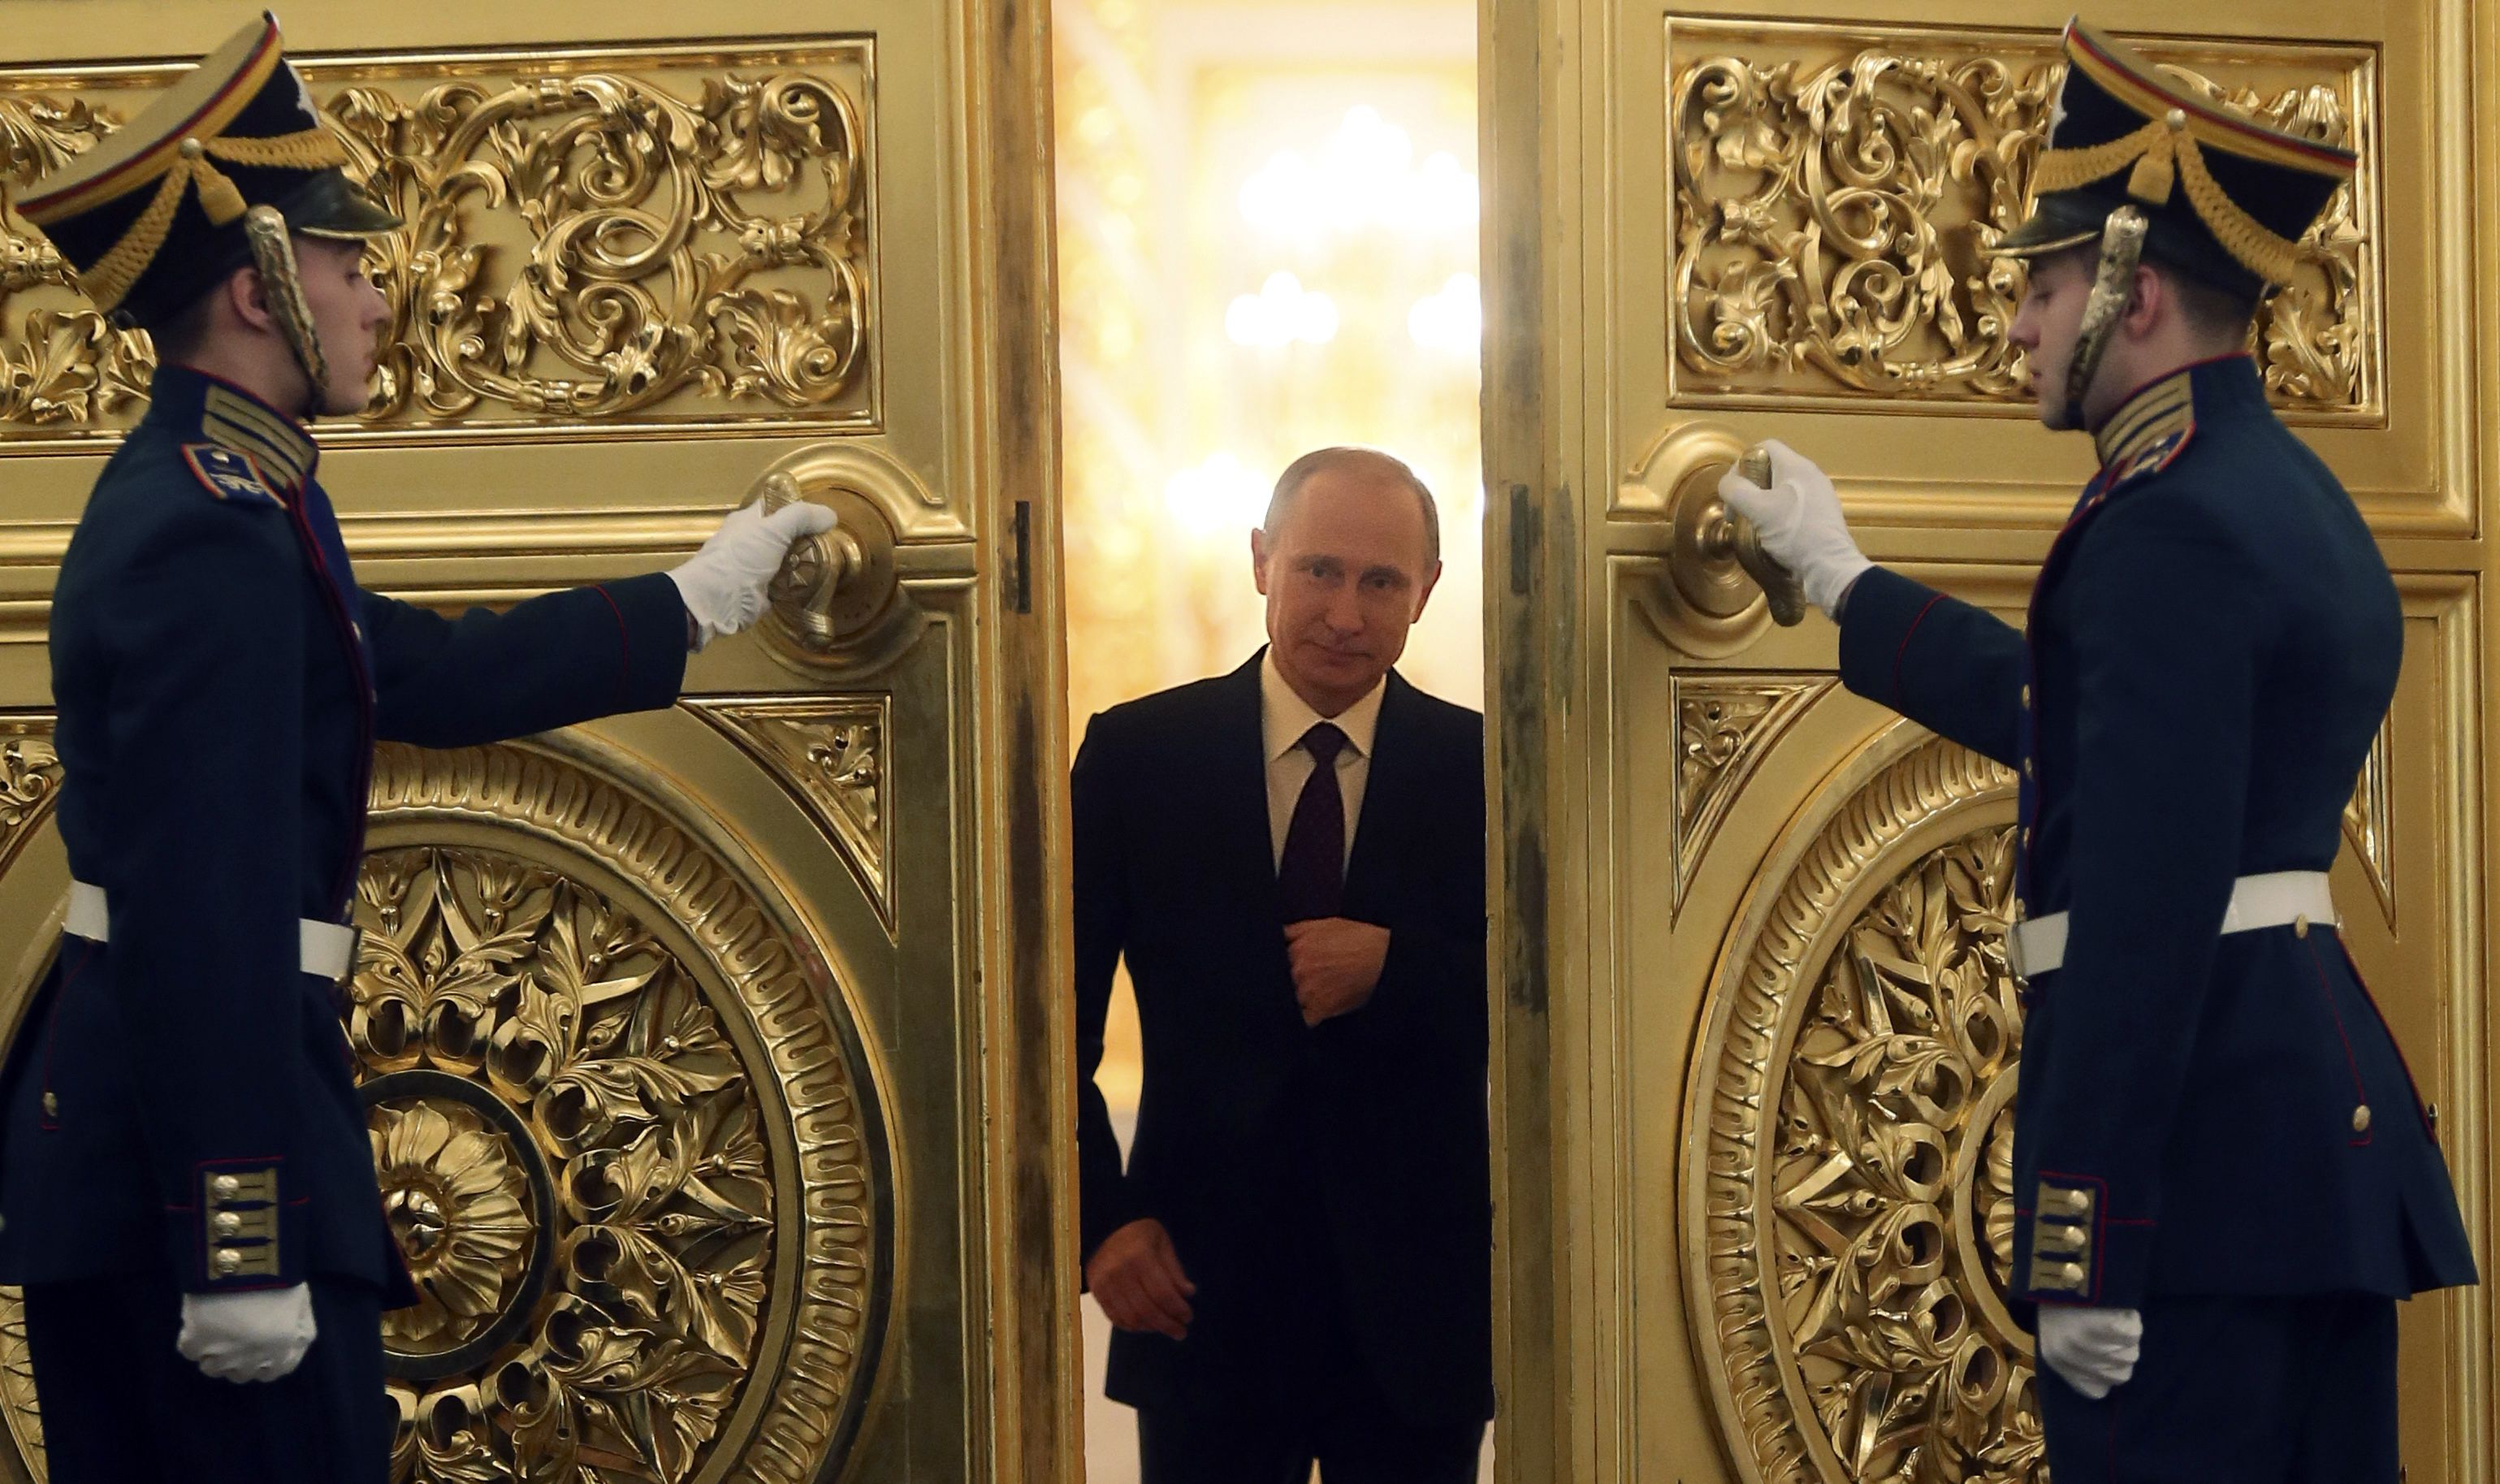 Crédit REUTERS/Sergei Ilnitsky/Pool